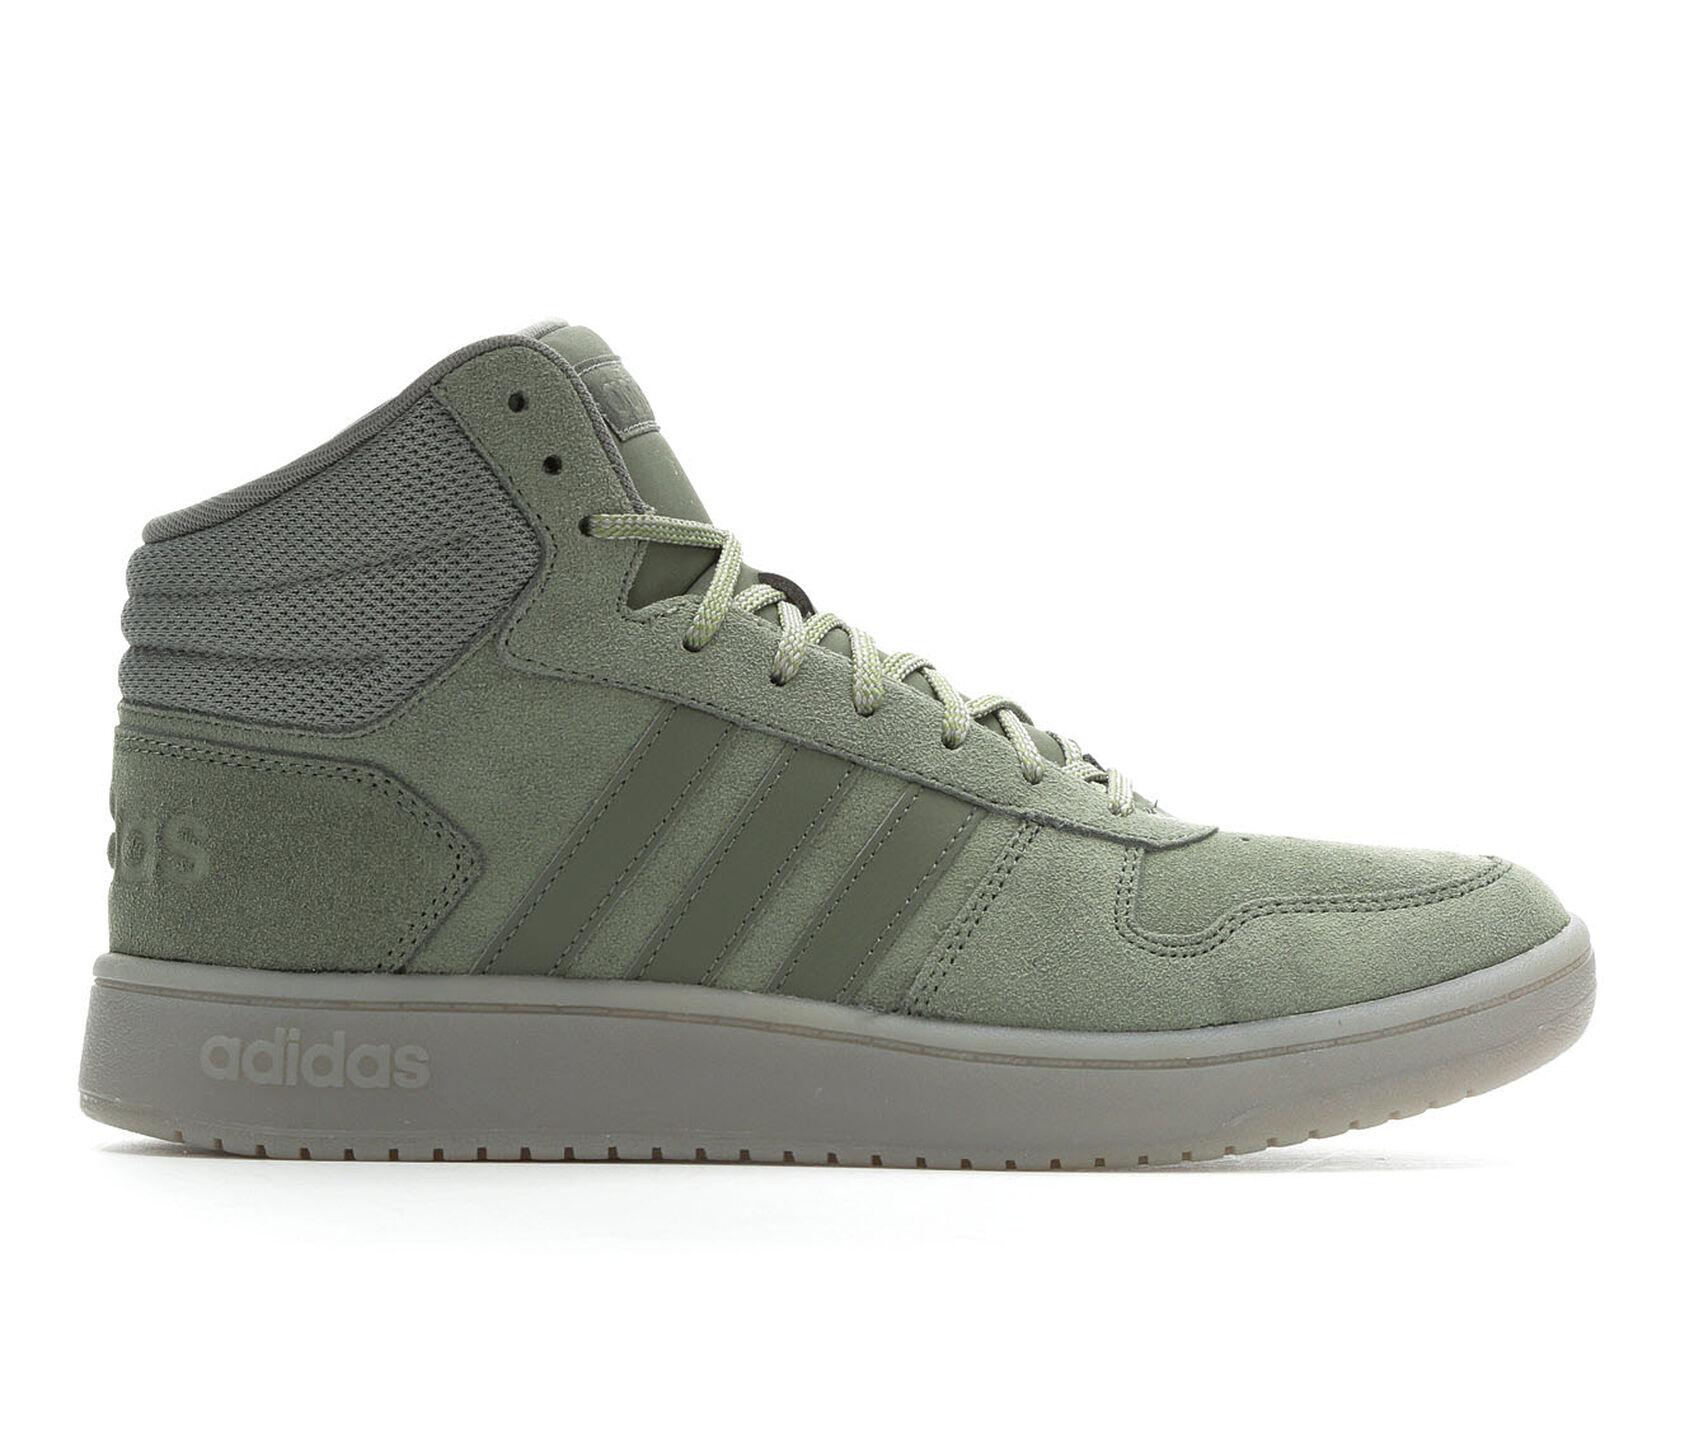 f746f0f87195 Men s Adidas Hoops 2.0 Mid SE Retro Sneakers